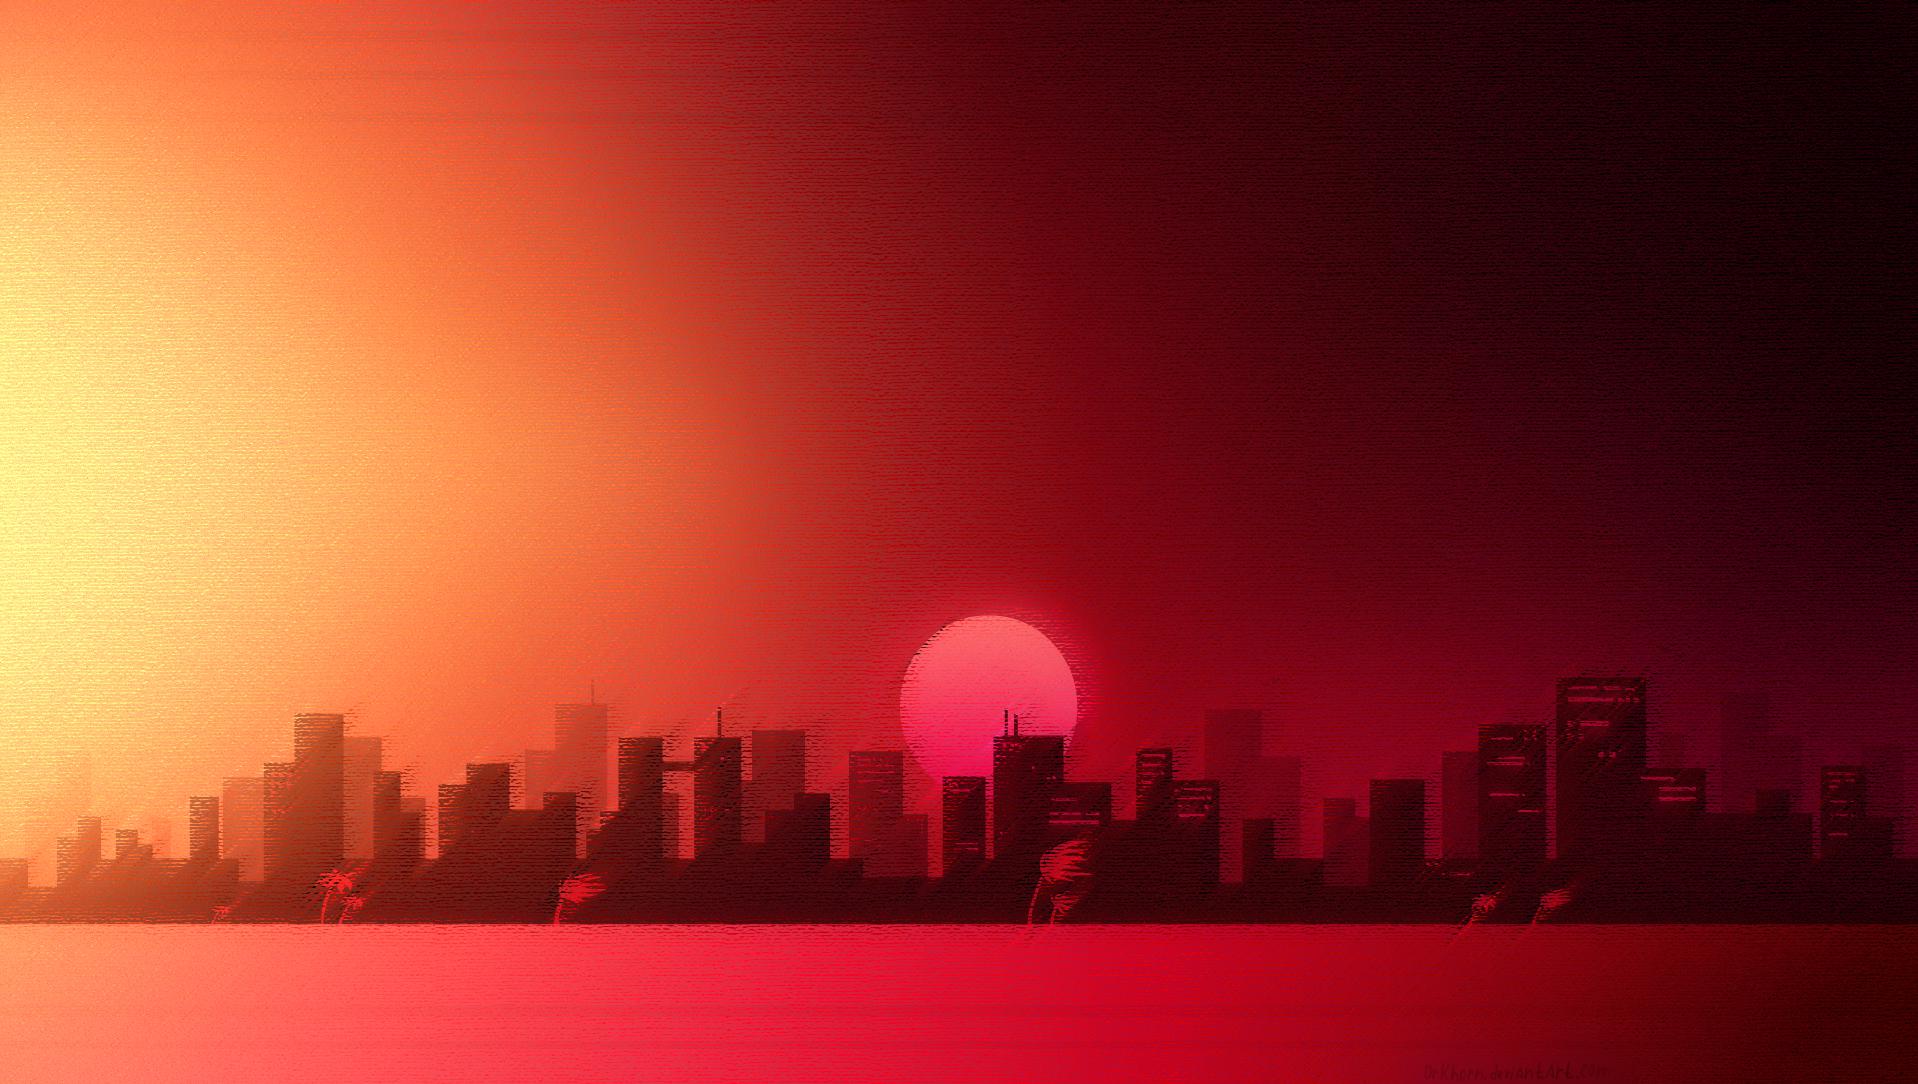 wallpaper video games sunset city cityscape sky. Black Bedroom Furniture Sets. Home Design Ideas